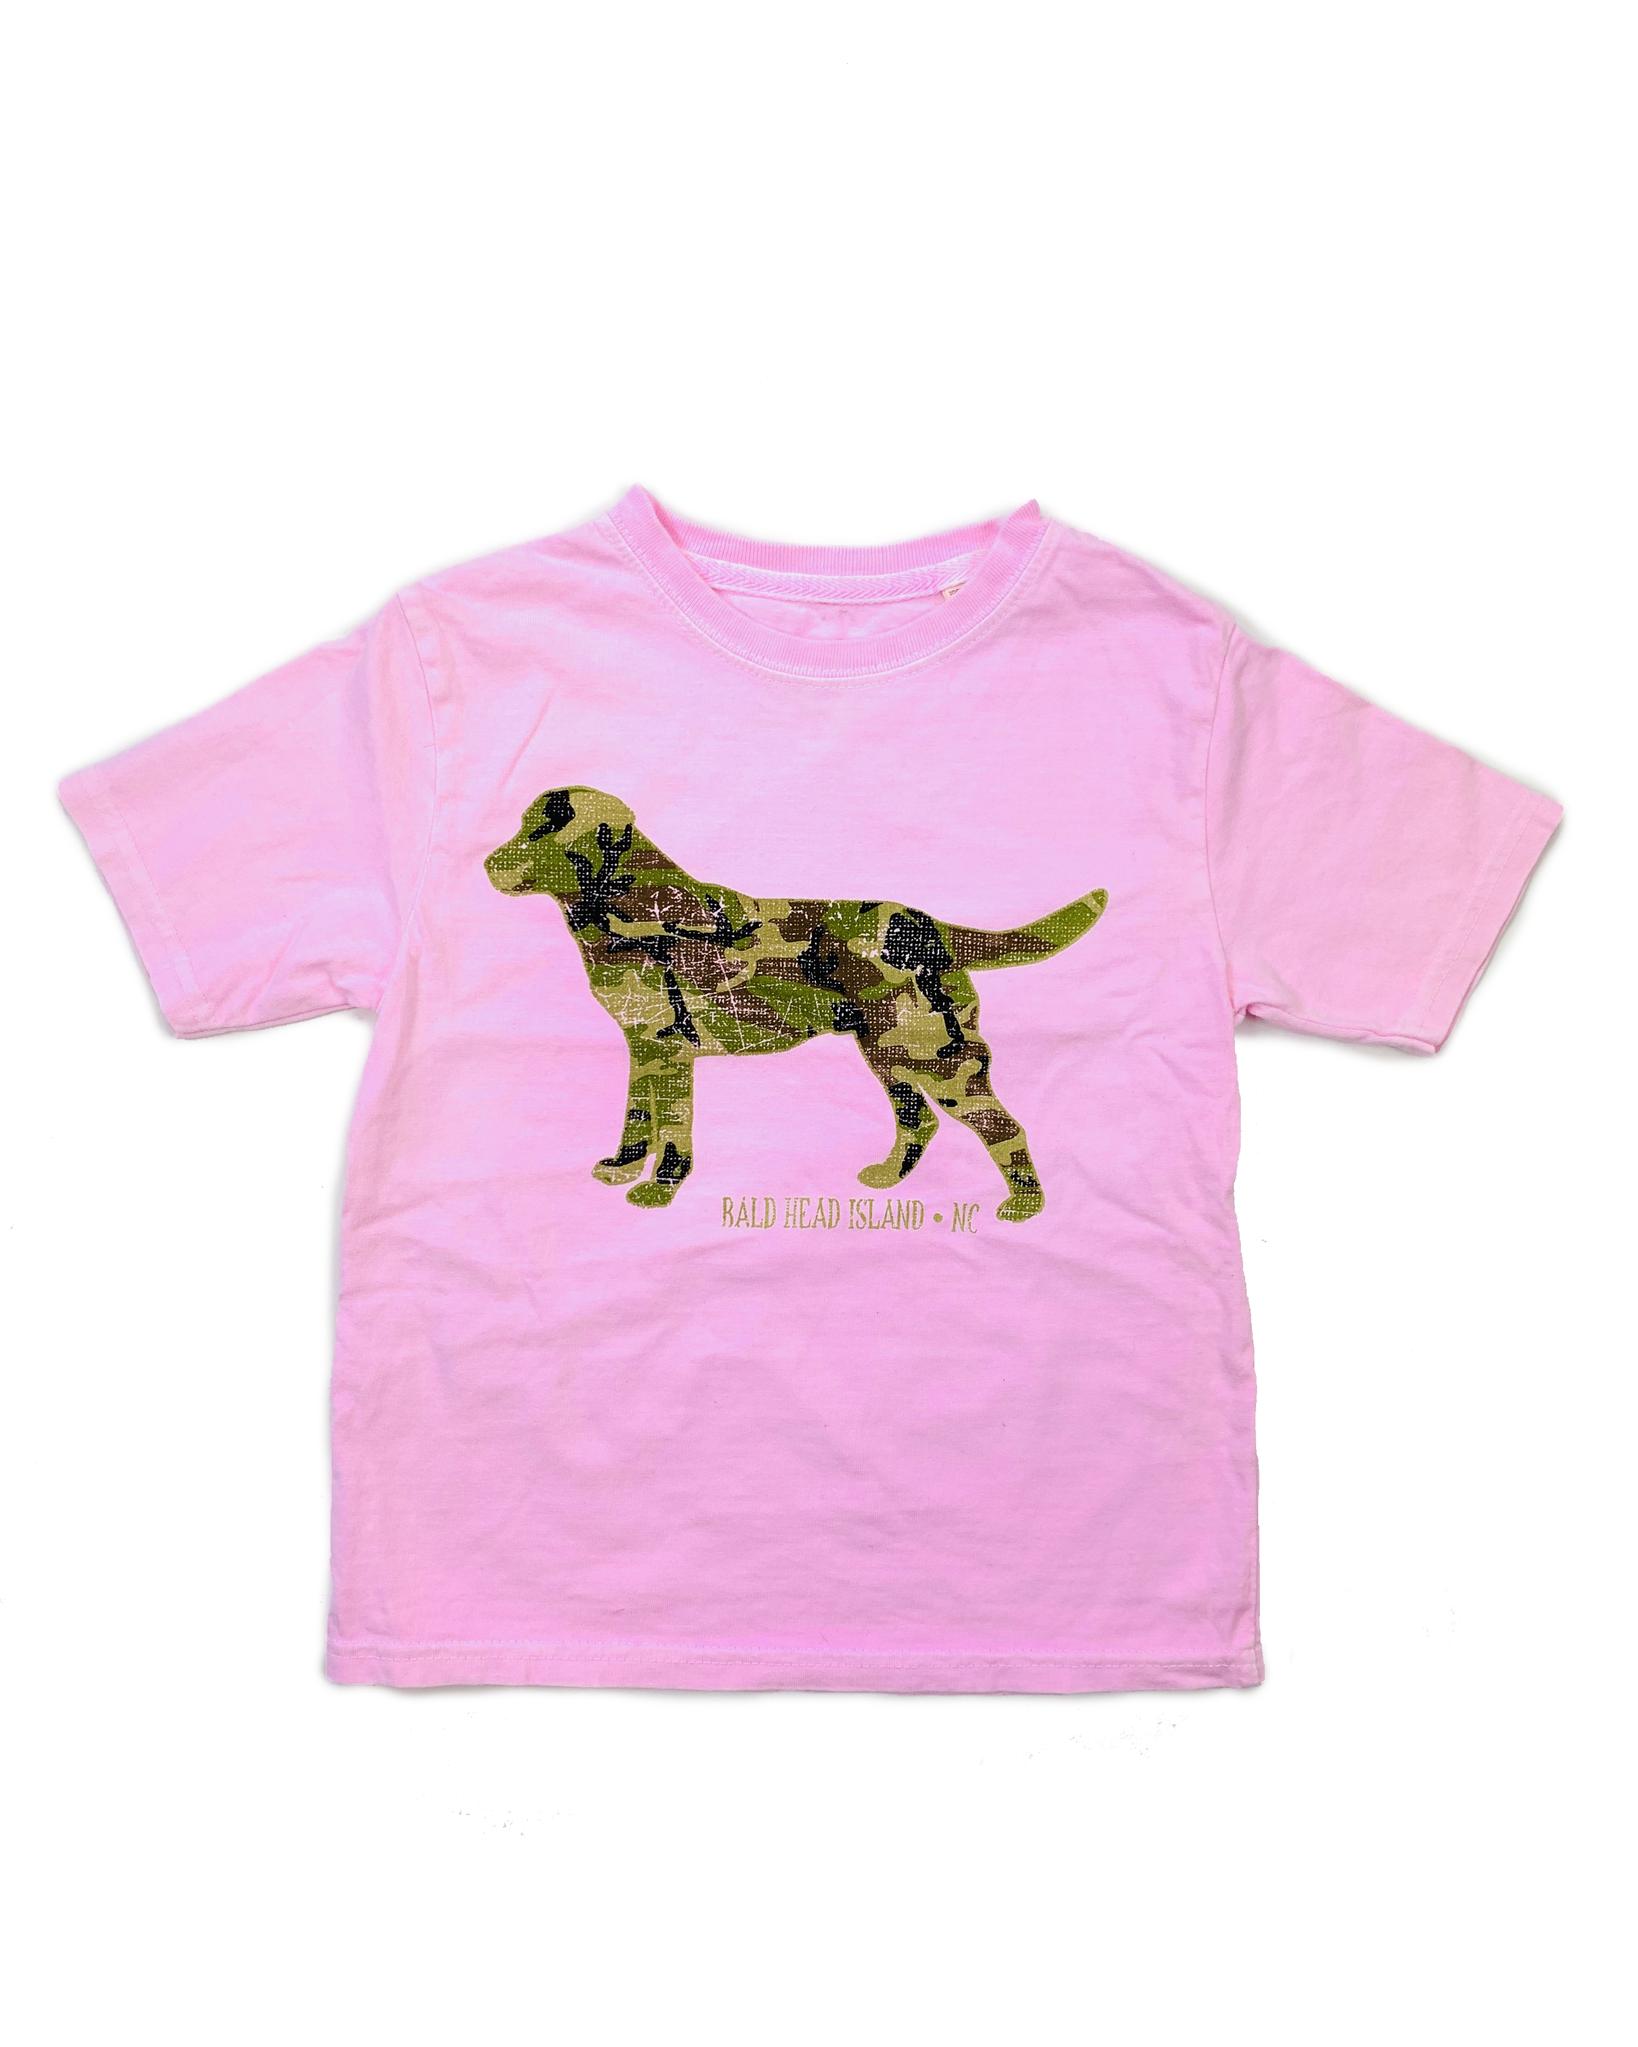 Lake Shirts Camo Kennel Club Youth